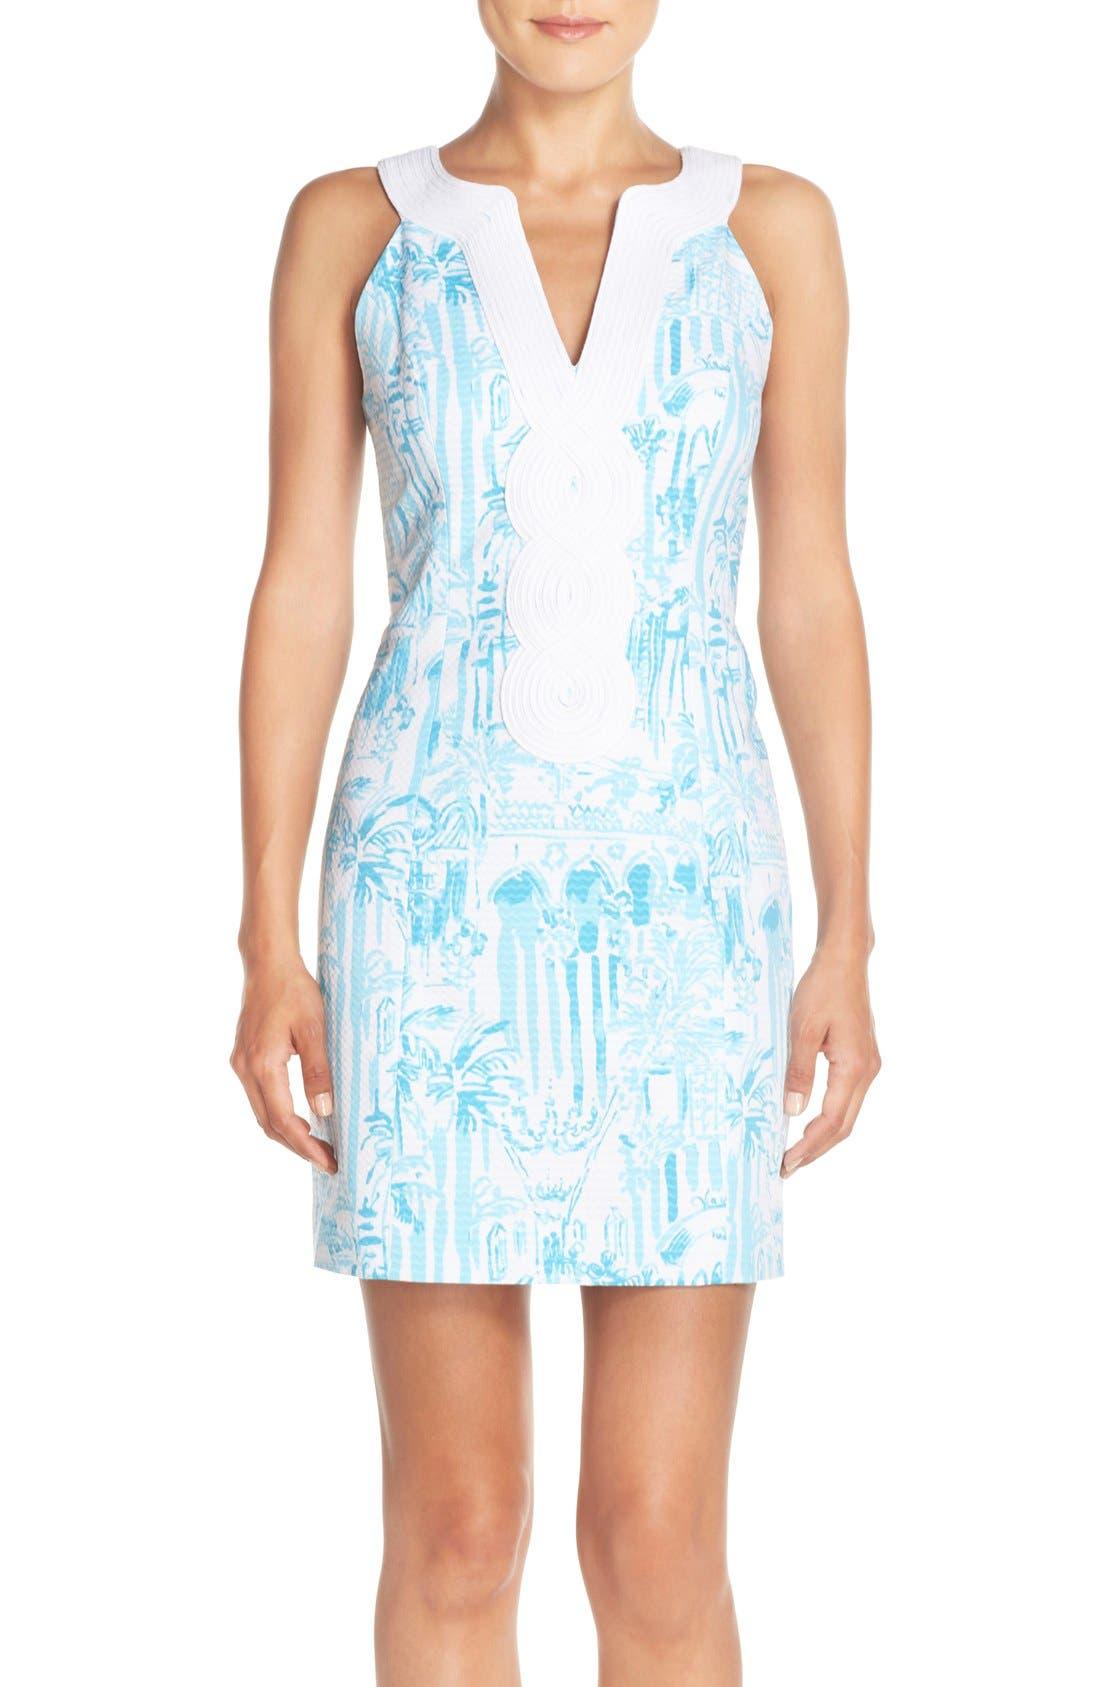 Main Image - Lilly Pulitzer® 'Valli' Soutache Print Jacquard Sheath Dress